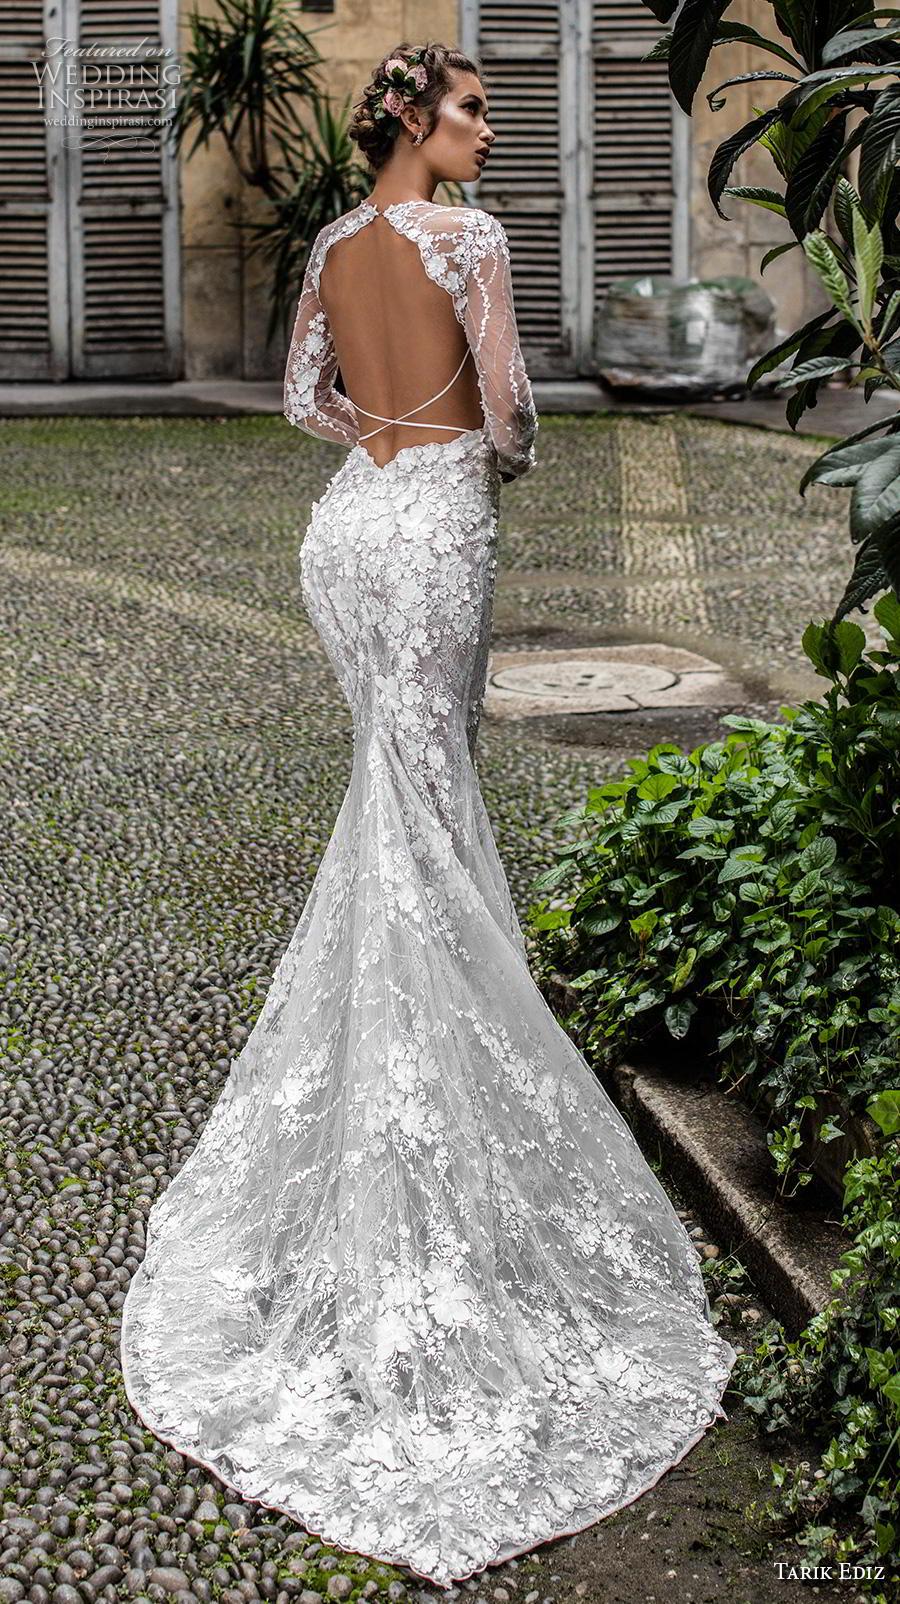 tarik ediz 2019 bridal long sleeves illusion jewel sweetheart neckline full embellishment elegant fit and flare wedding dress low keyhole back chapel train (15) bv